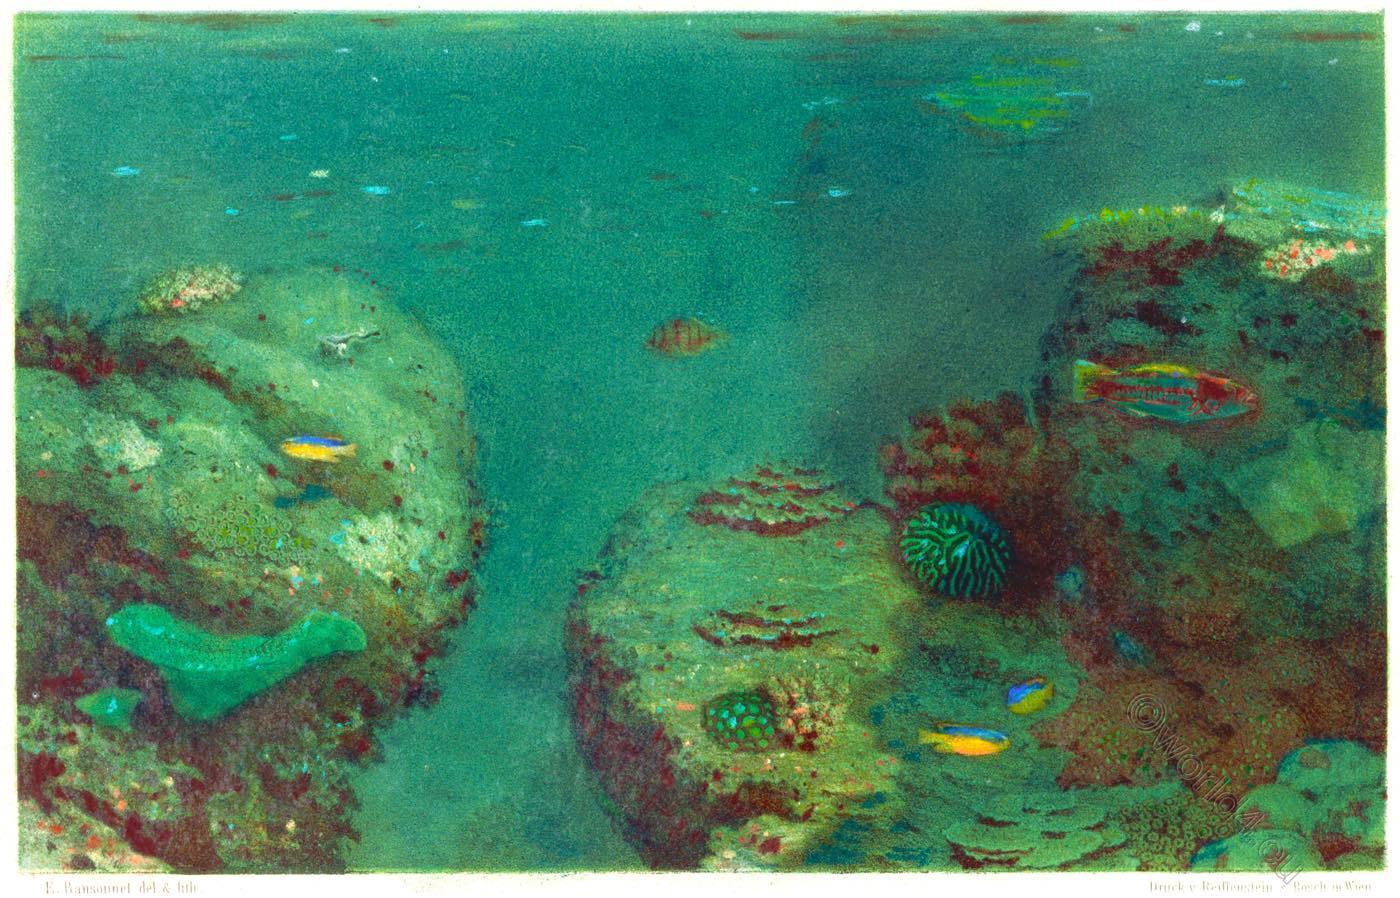 Sri Lanka, Corals, Submarine, Travel, diving,